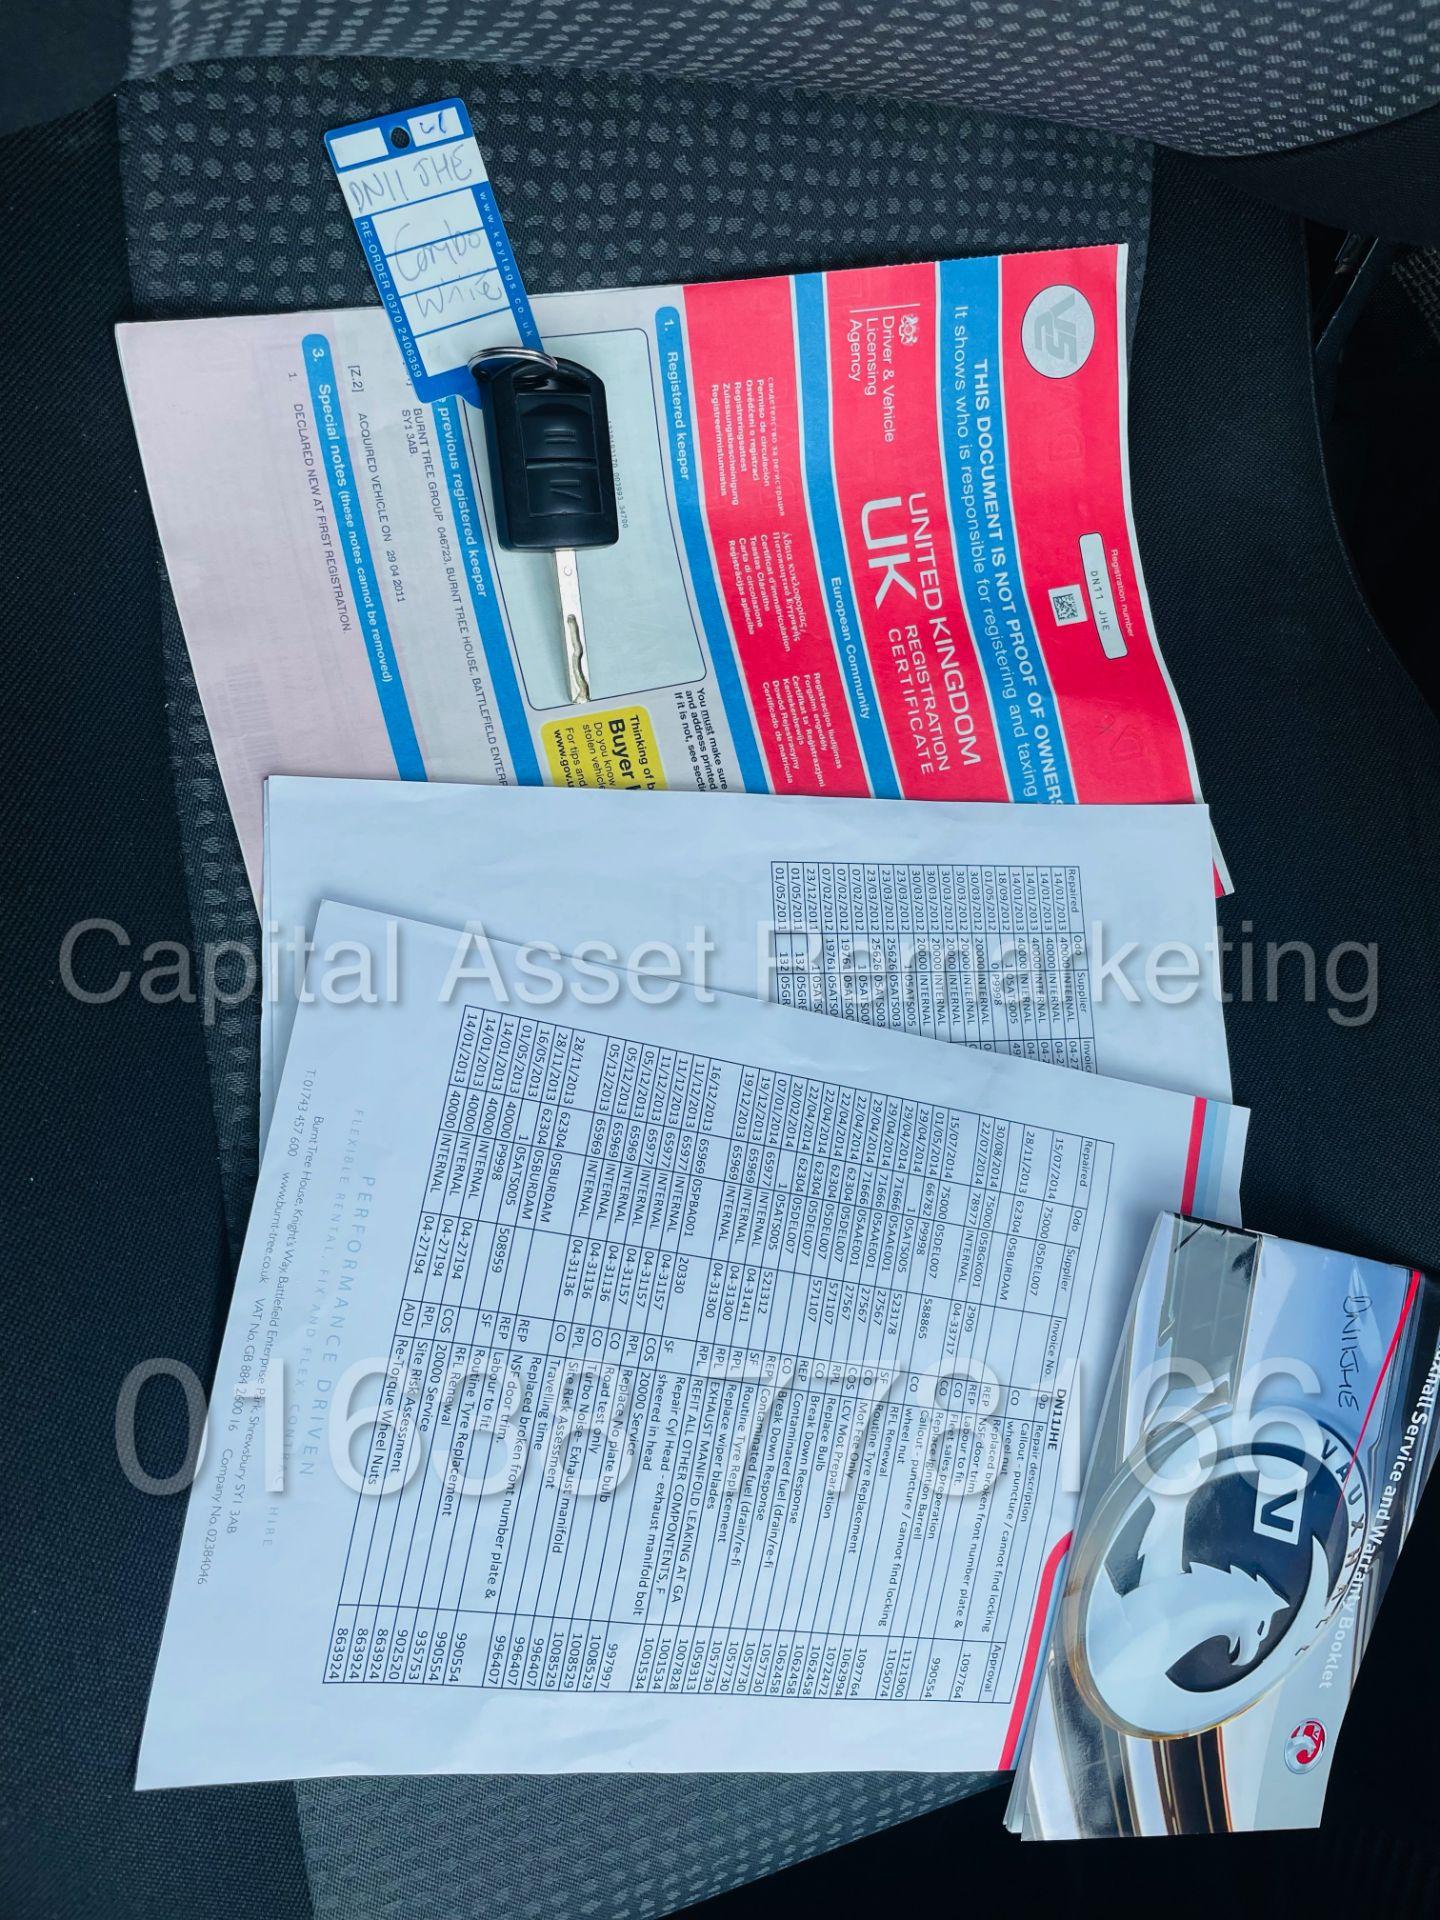 (On Sale) VAUXHALL COMBO CDTI *5 SEATER CREW VAN* (2011 - 11 REG) 'CDTI - 5 SPEED' (1 FORMER KEEPER) - Image 21 of 44